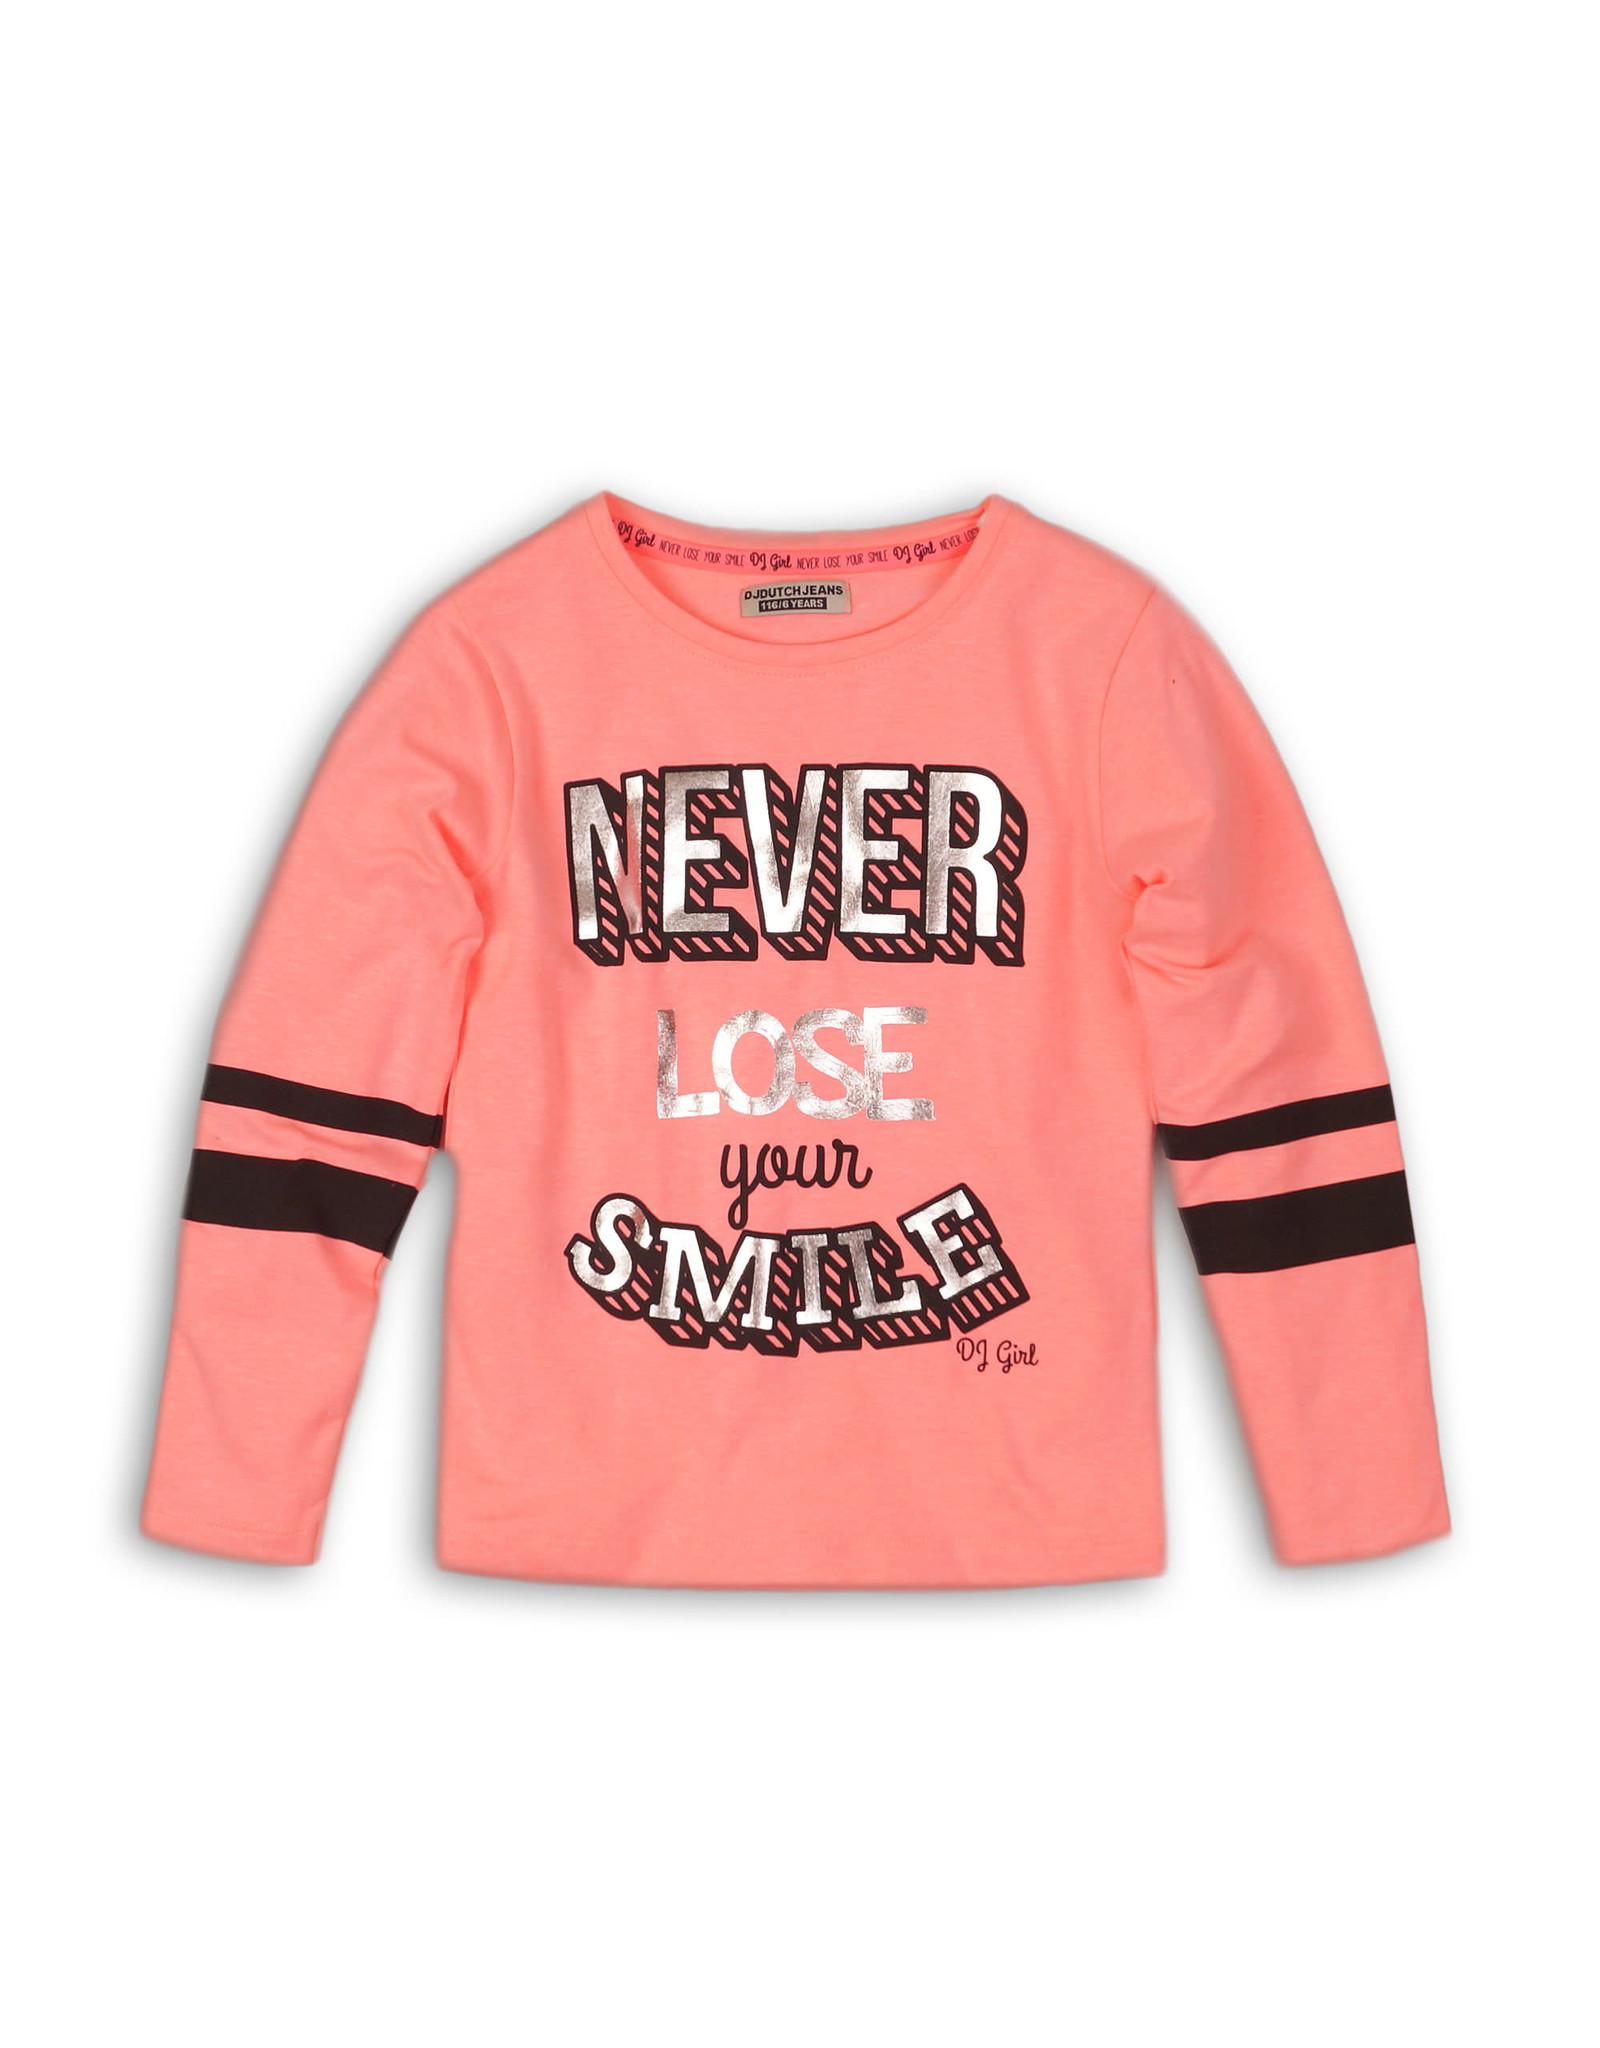 DJ Dutchjeans DJ Dutchjeans meiden shirt NEVER LOSE YOUR SMILE